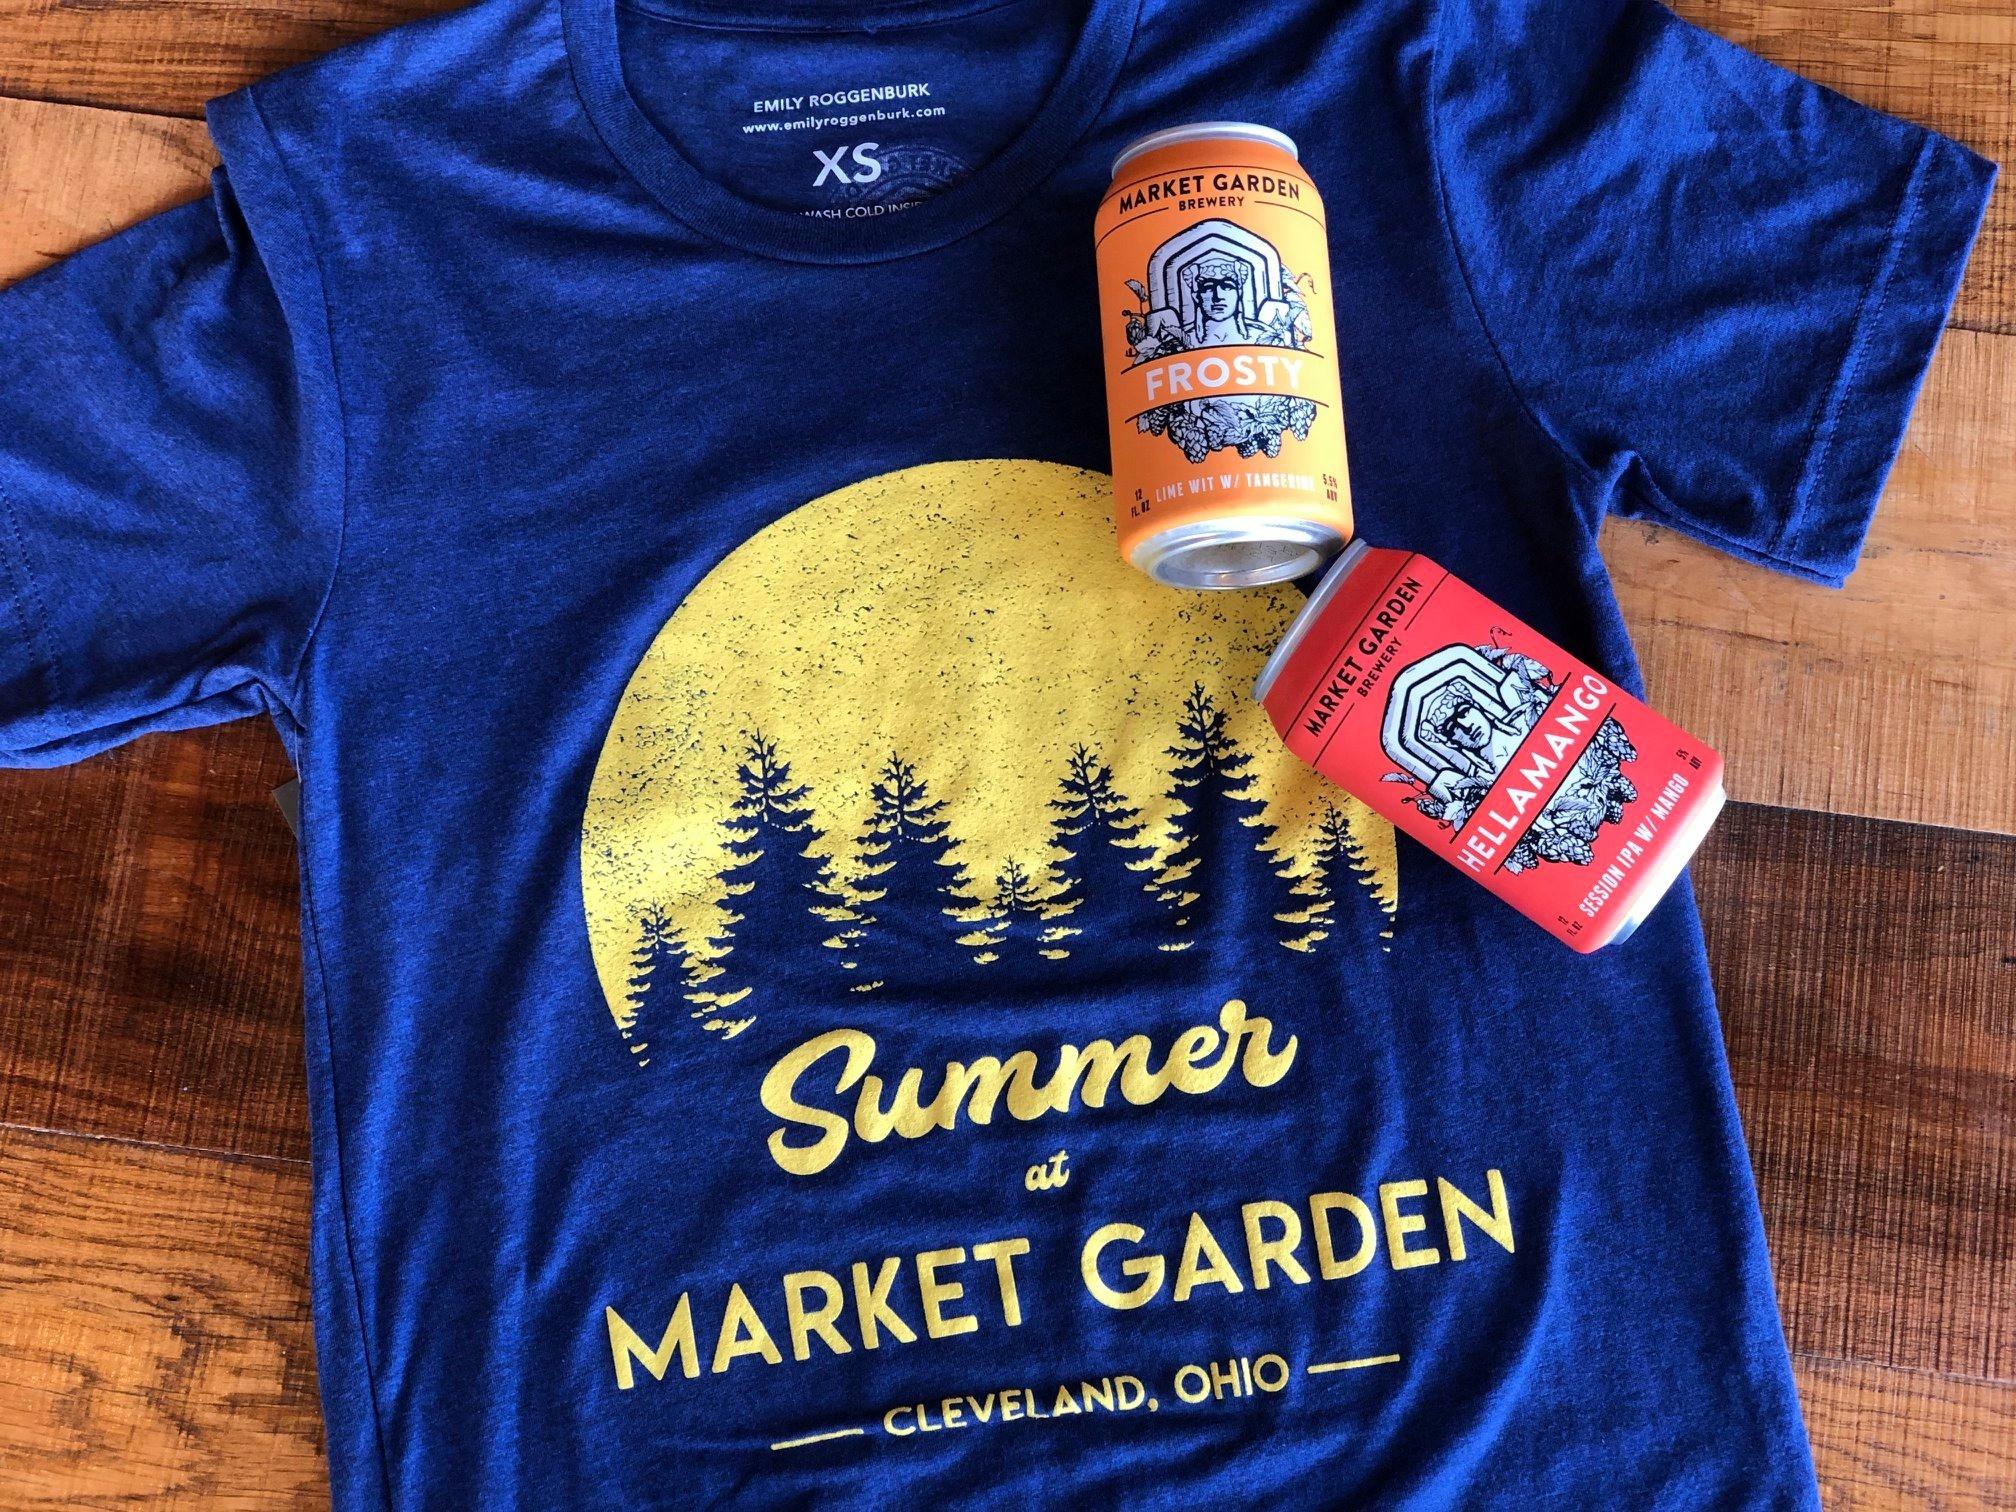 Summer @ MG T-Shirt (by emilyroggenburk)